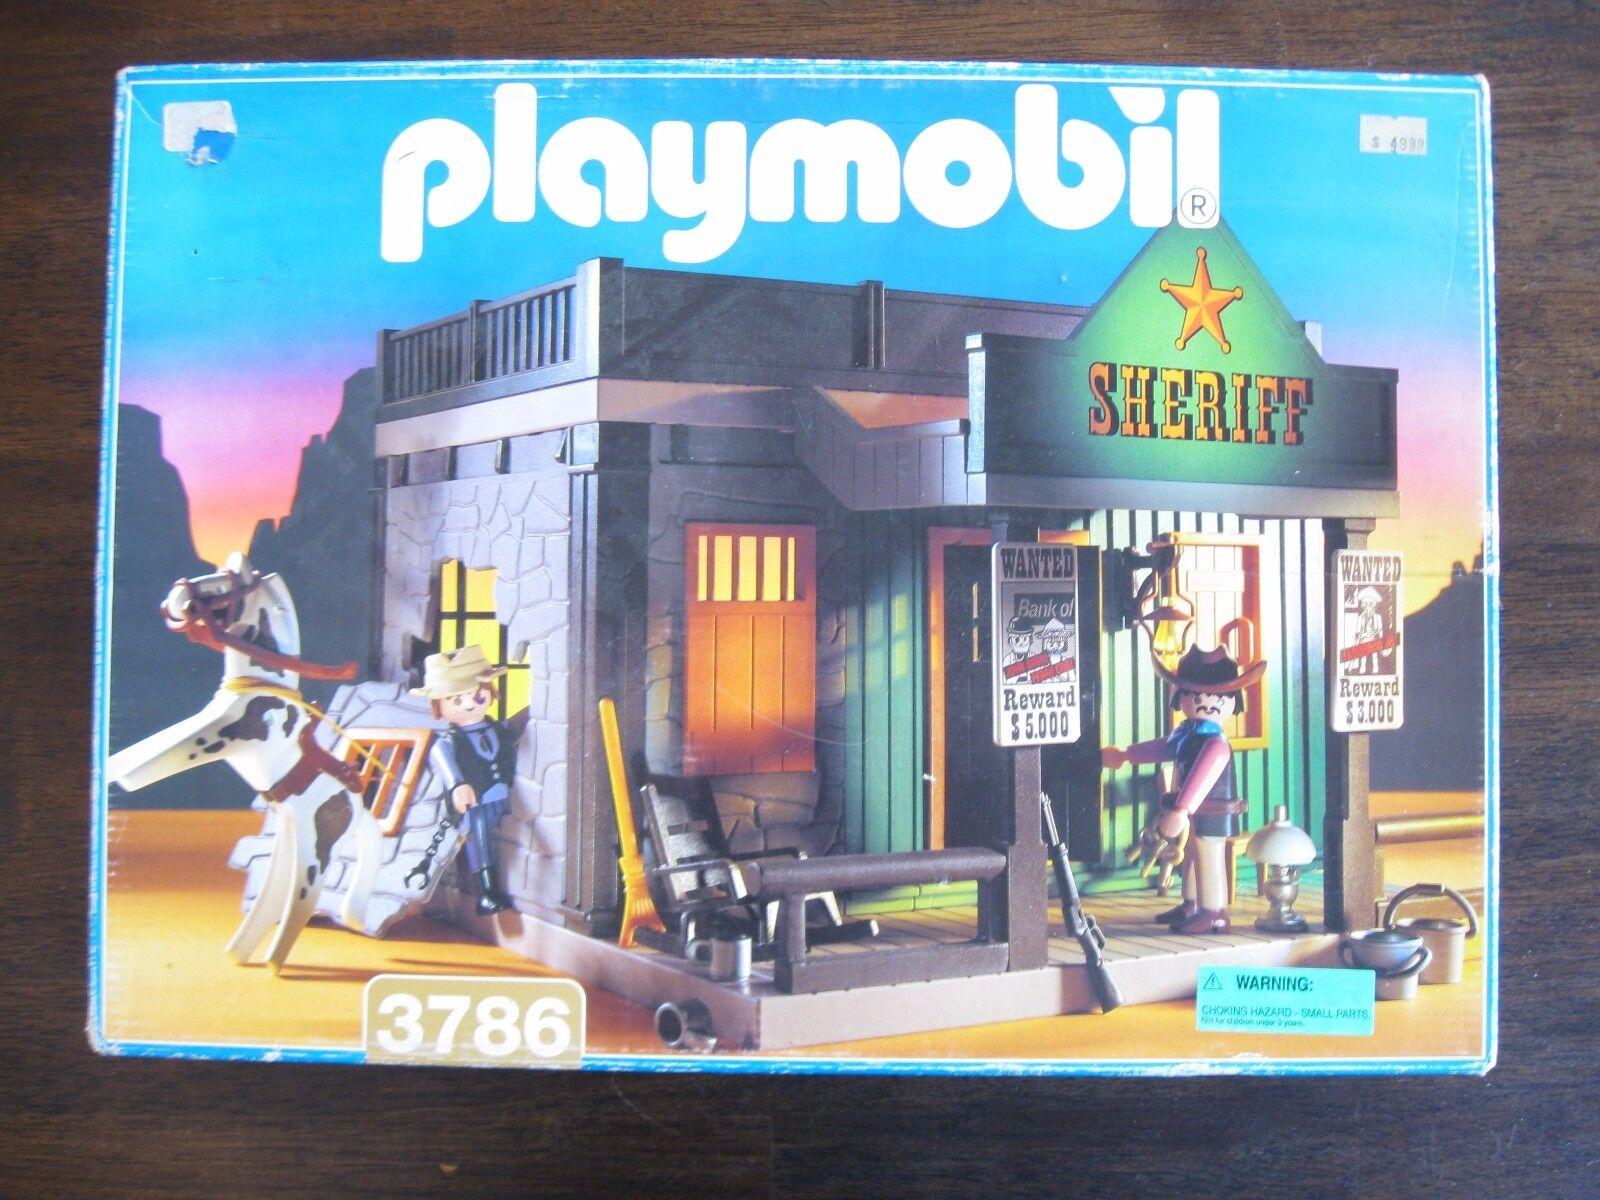 PLAYMOBIL VINTAGE 3786 SHERIFF 1994  EXCELLENT CONDITION-INSTRUCTIONS - NICE BOX  acheter des rabais